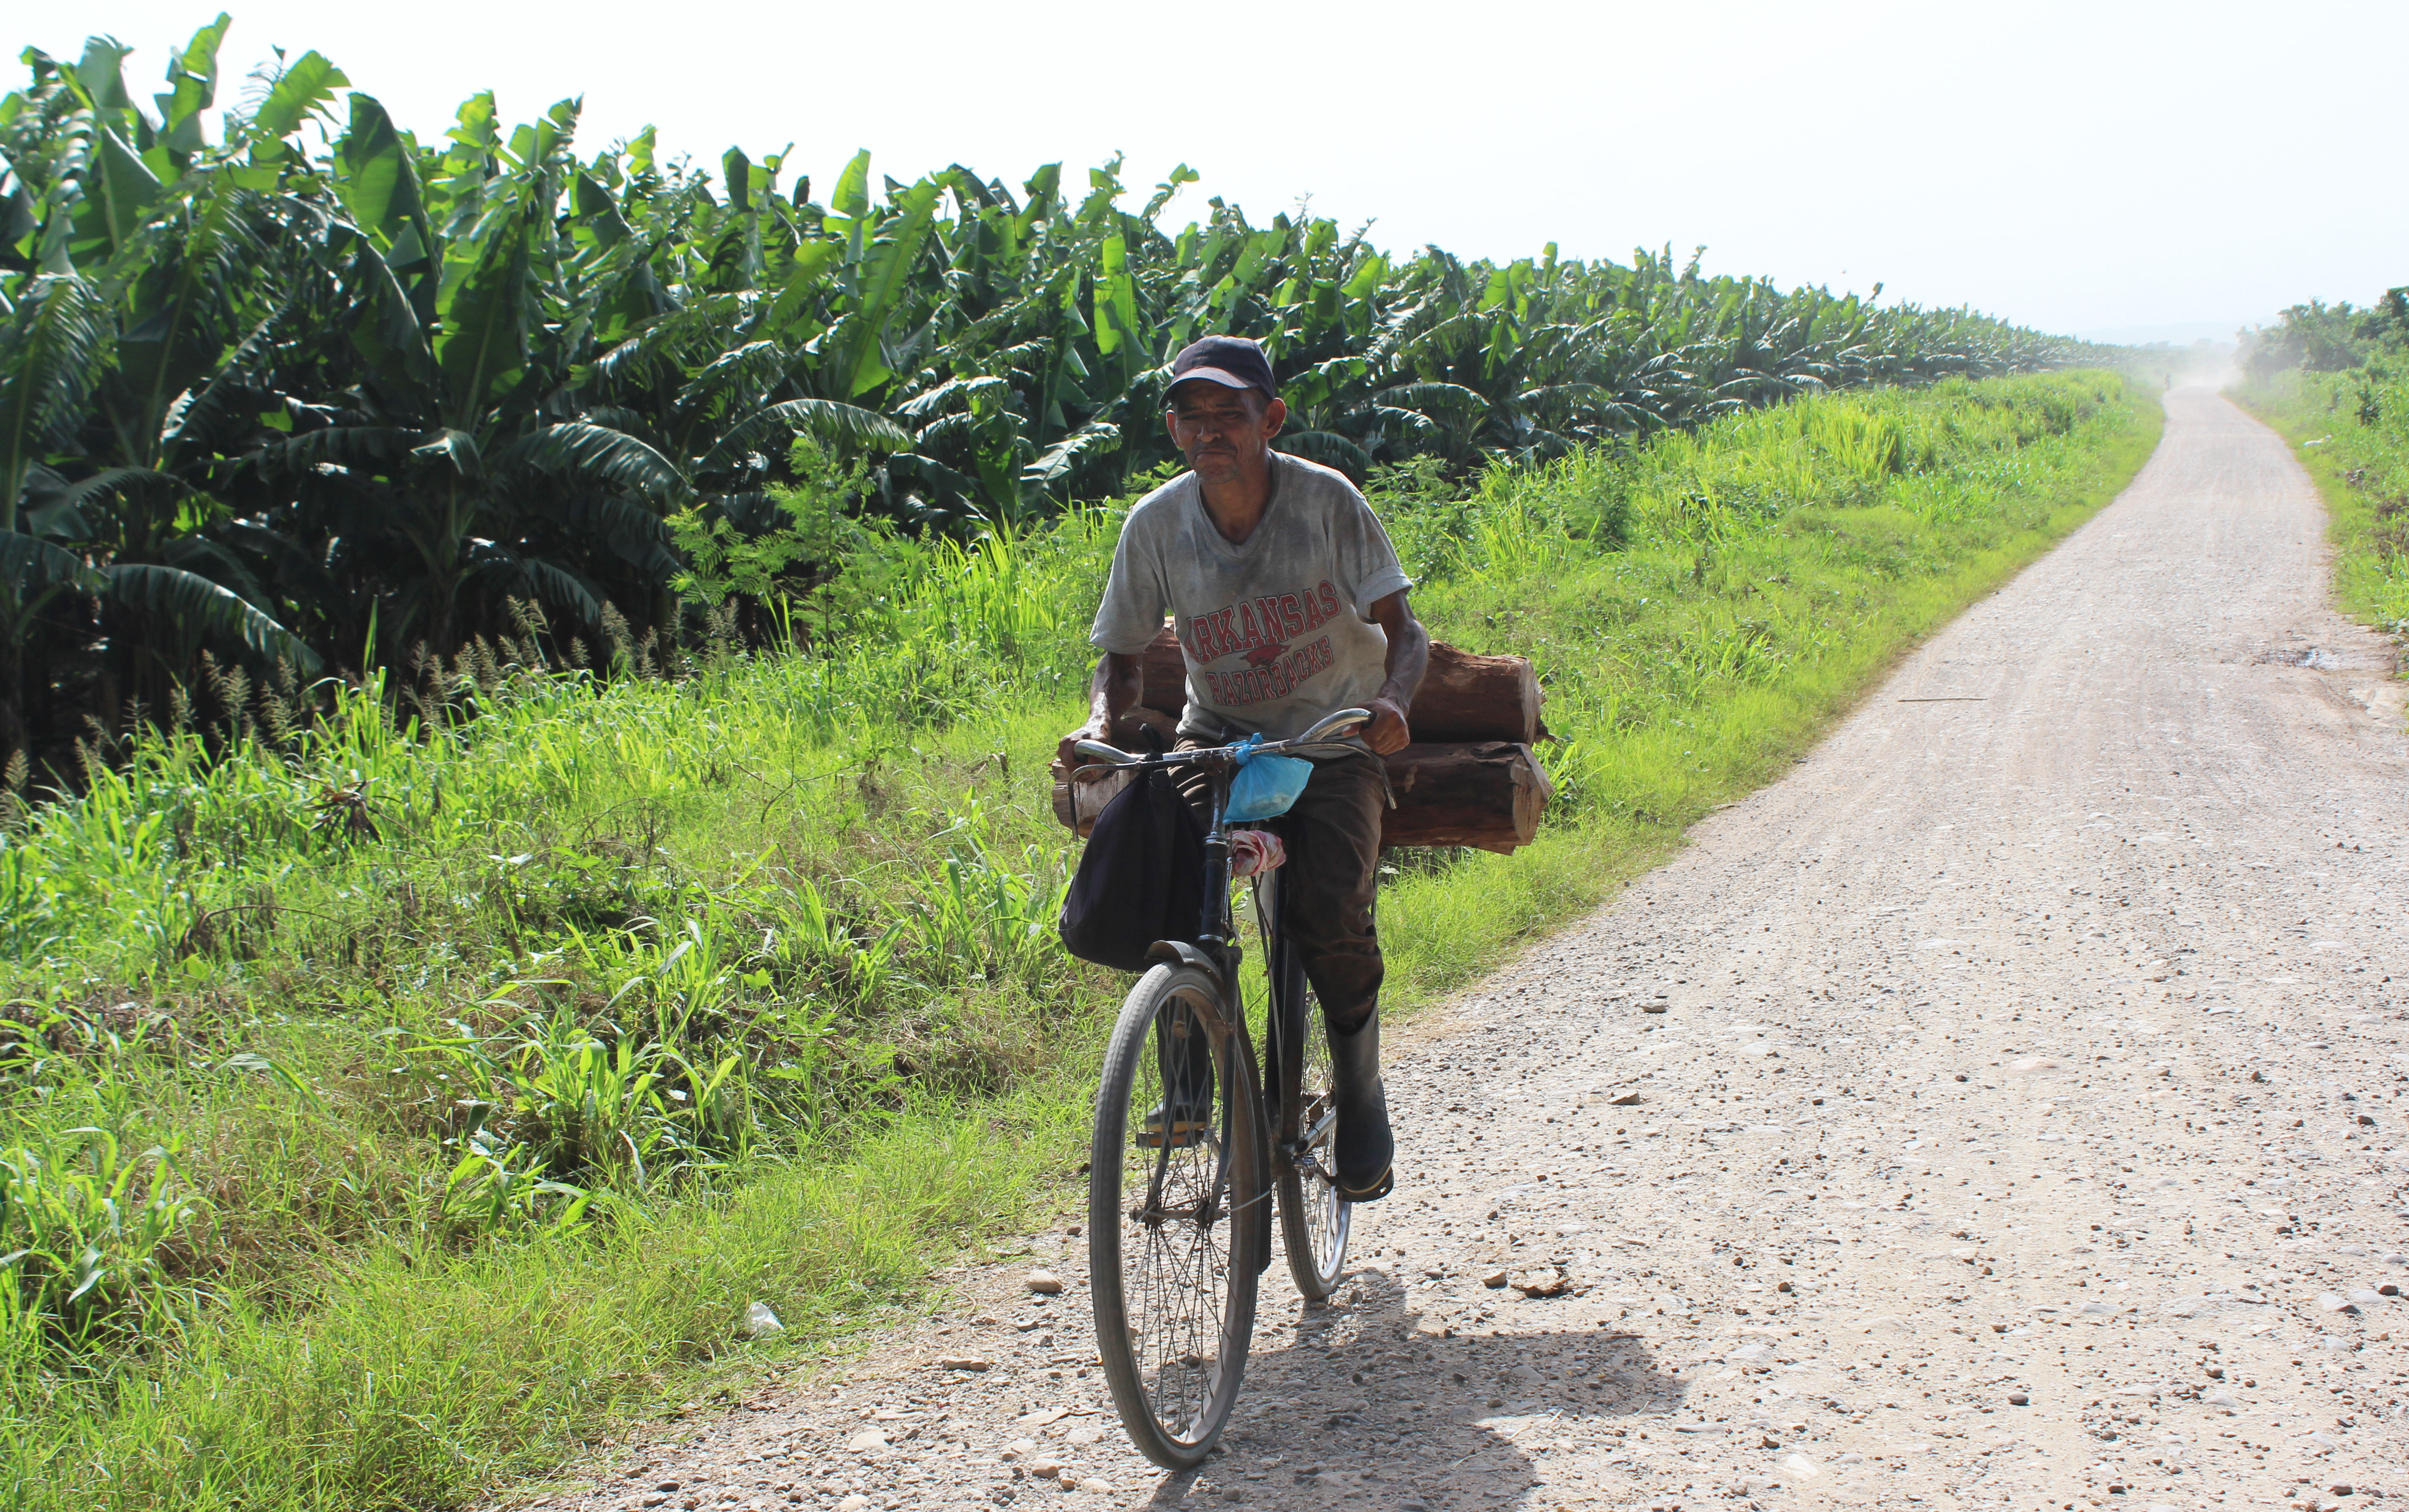 A man cycles past one of the few remaining banana plantations on Honduras's northern coast. (María José Burgos/CBC)